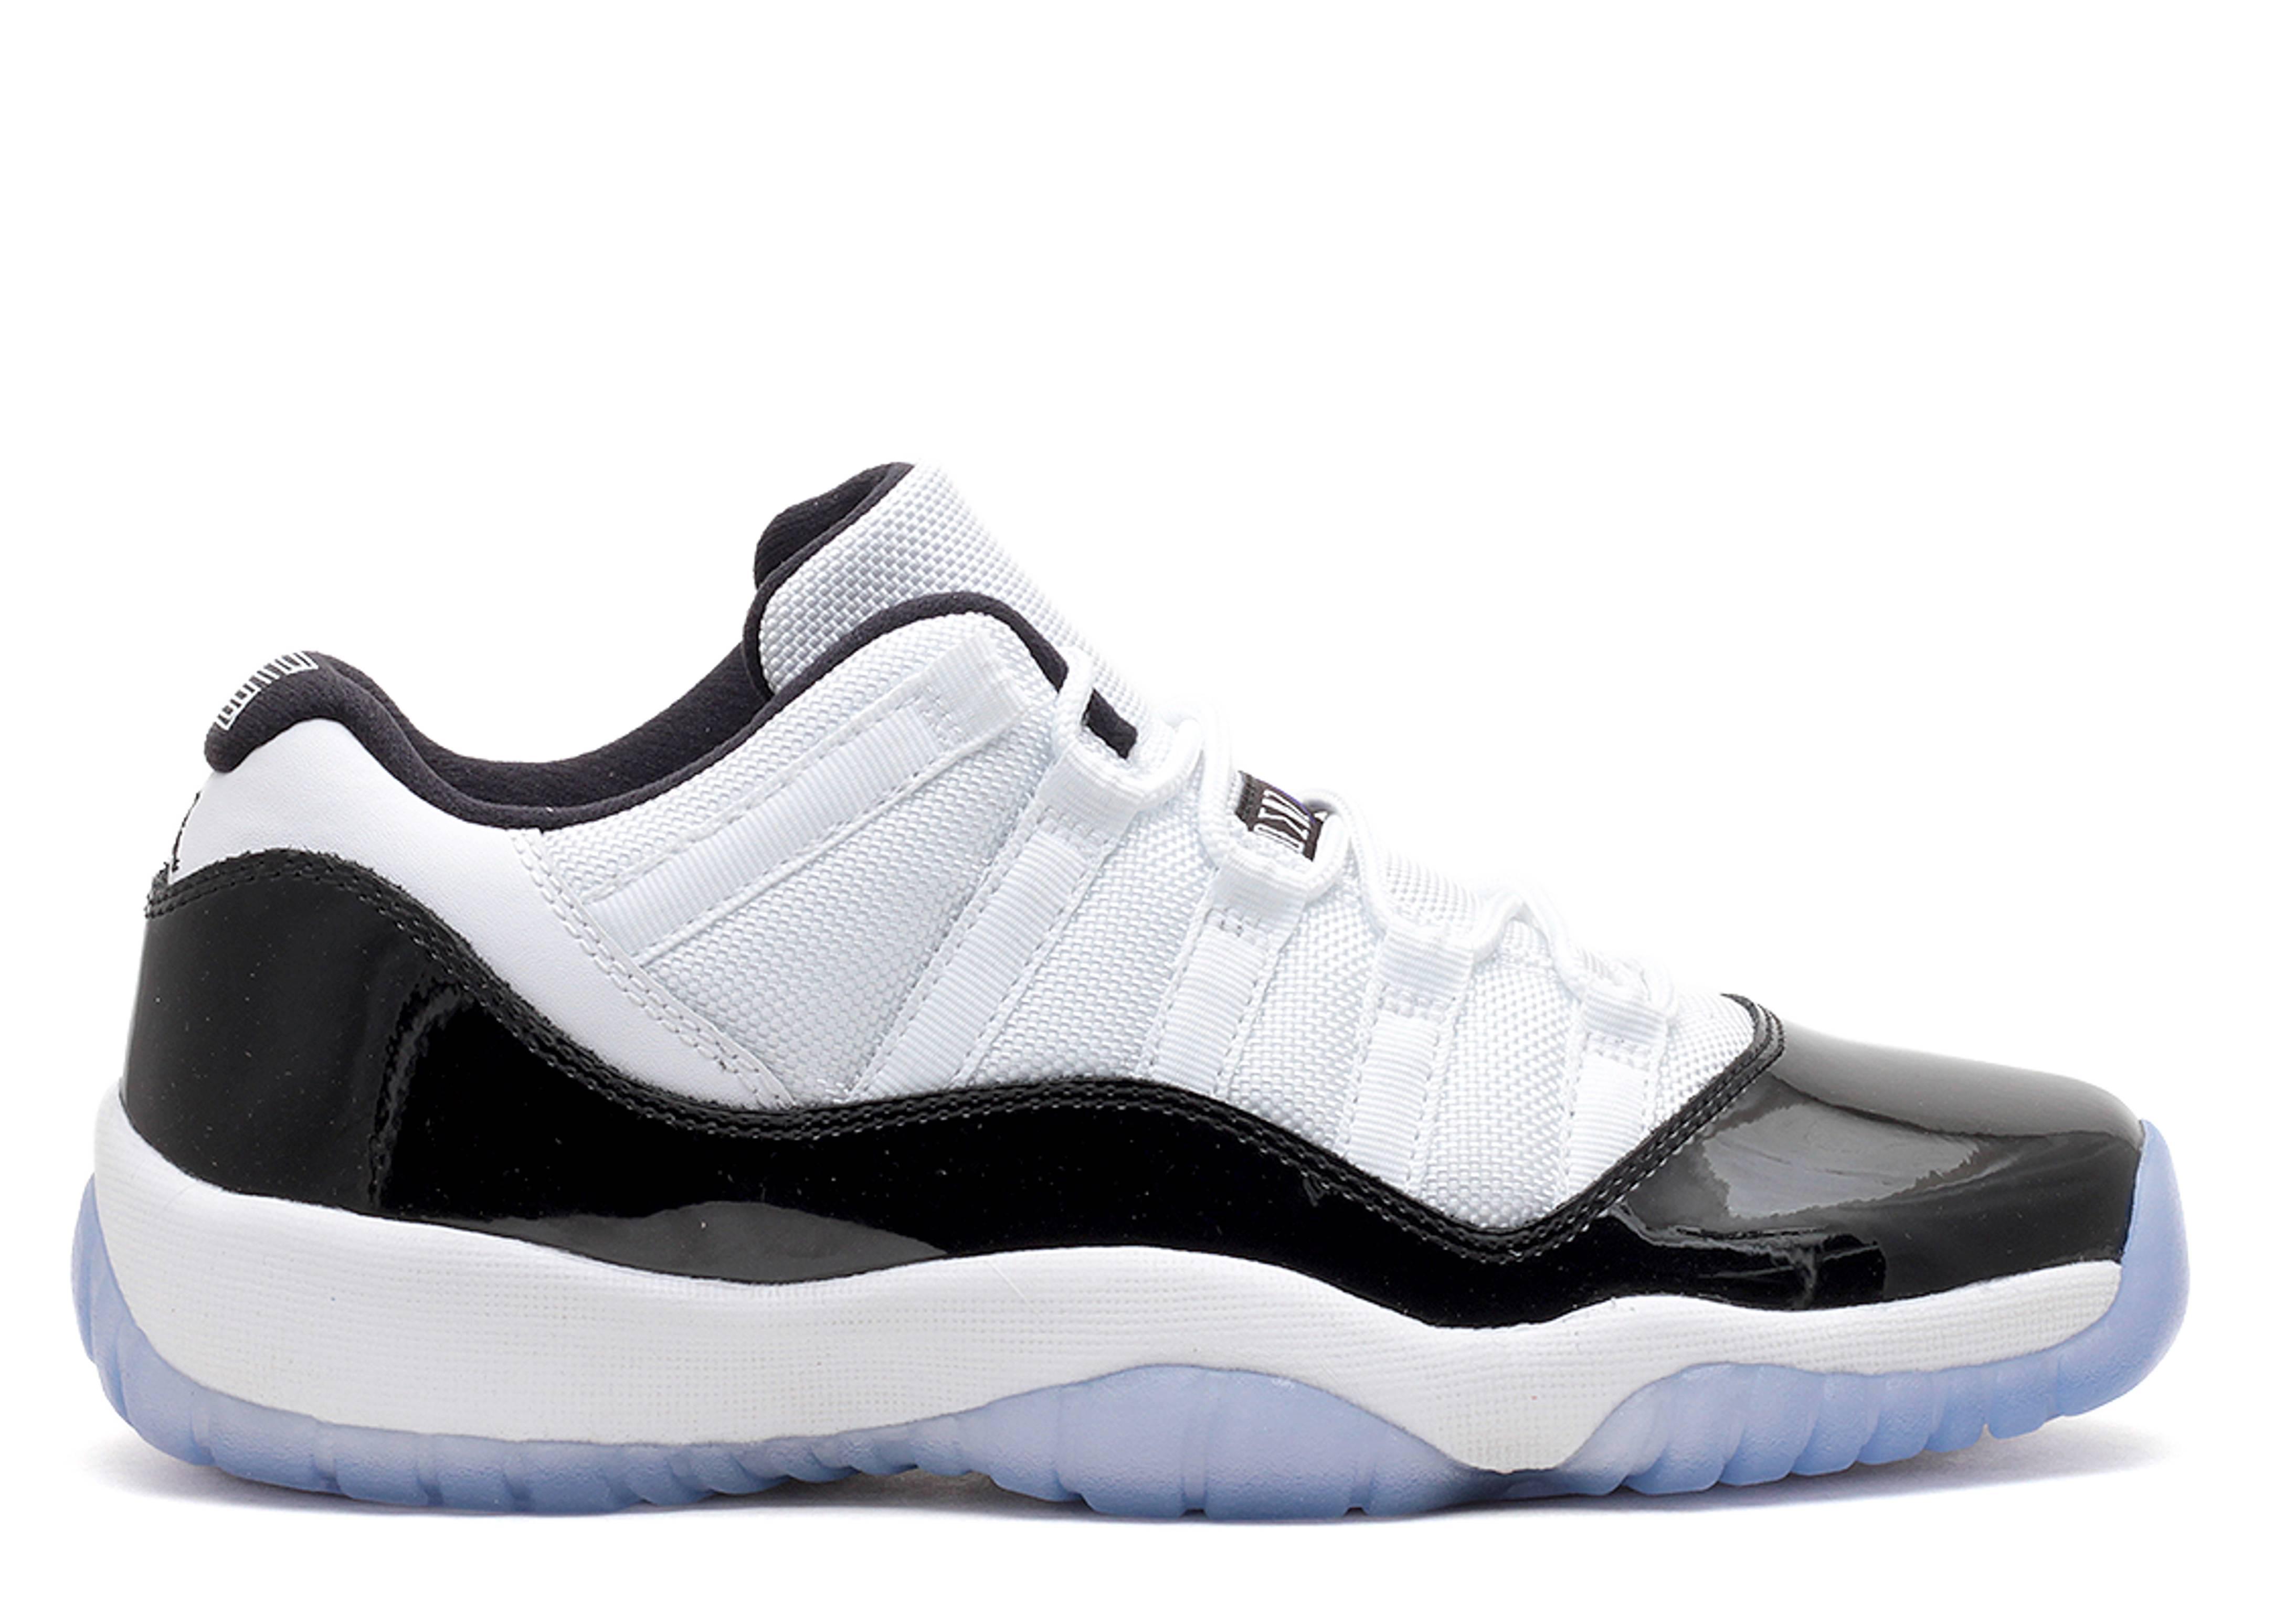 Air Jordan 11 White And Baby Blue